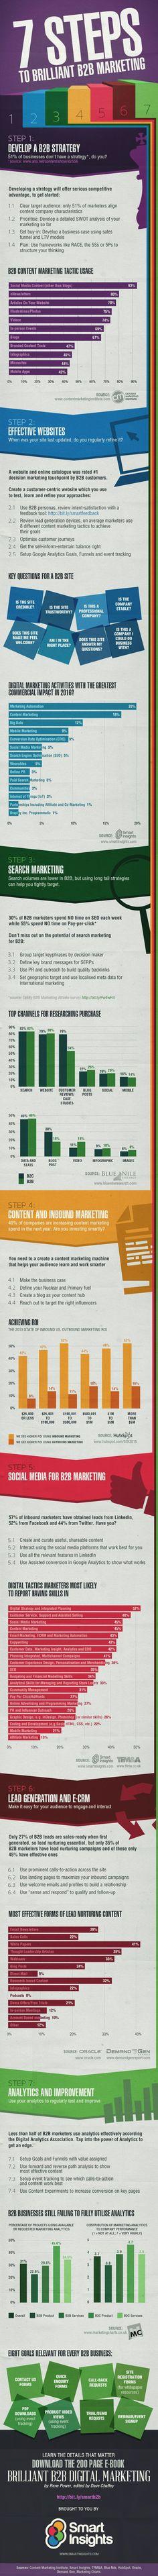 Creating a b2b digital marketing plan for 2017 infographic smart - 7 Steps To Brilliant B2b Digital Marketing 2015